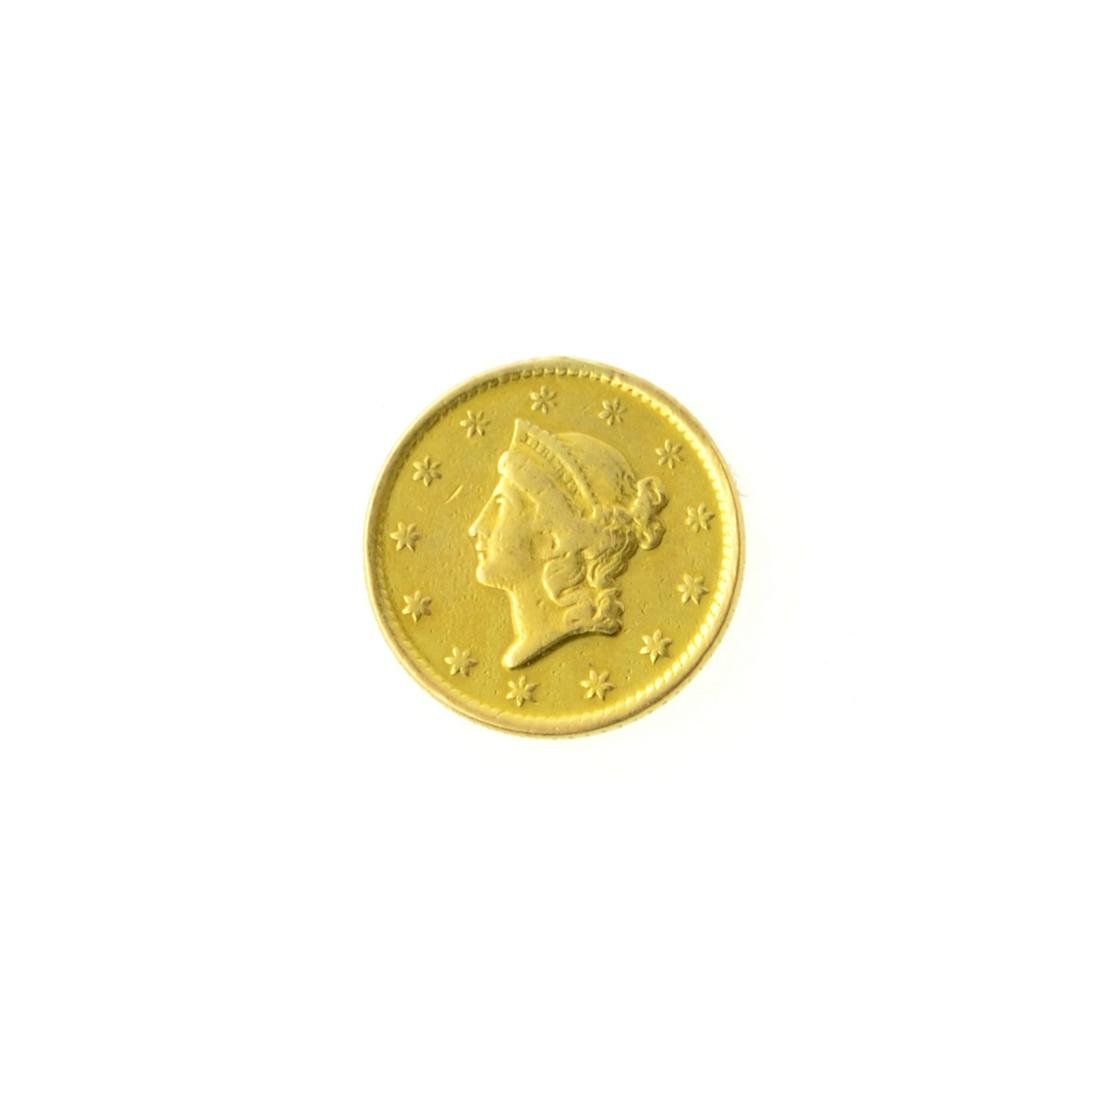 1849-O $1 U.S. Liberty Head Gold Coin